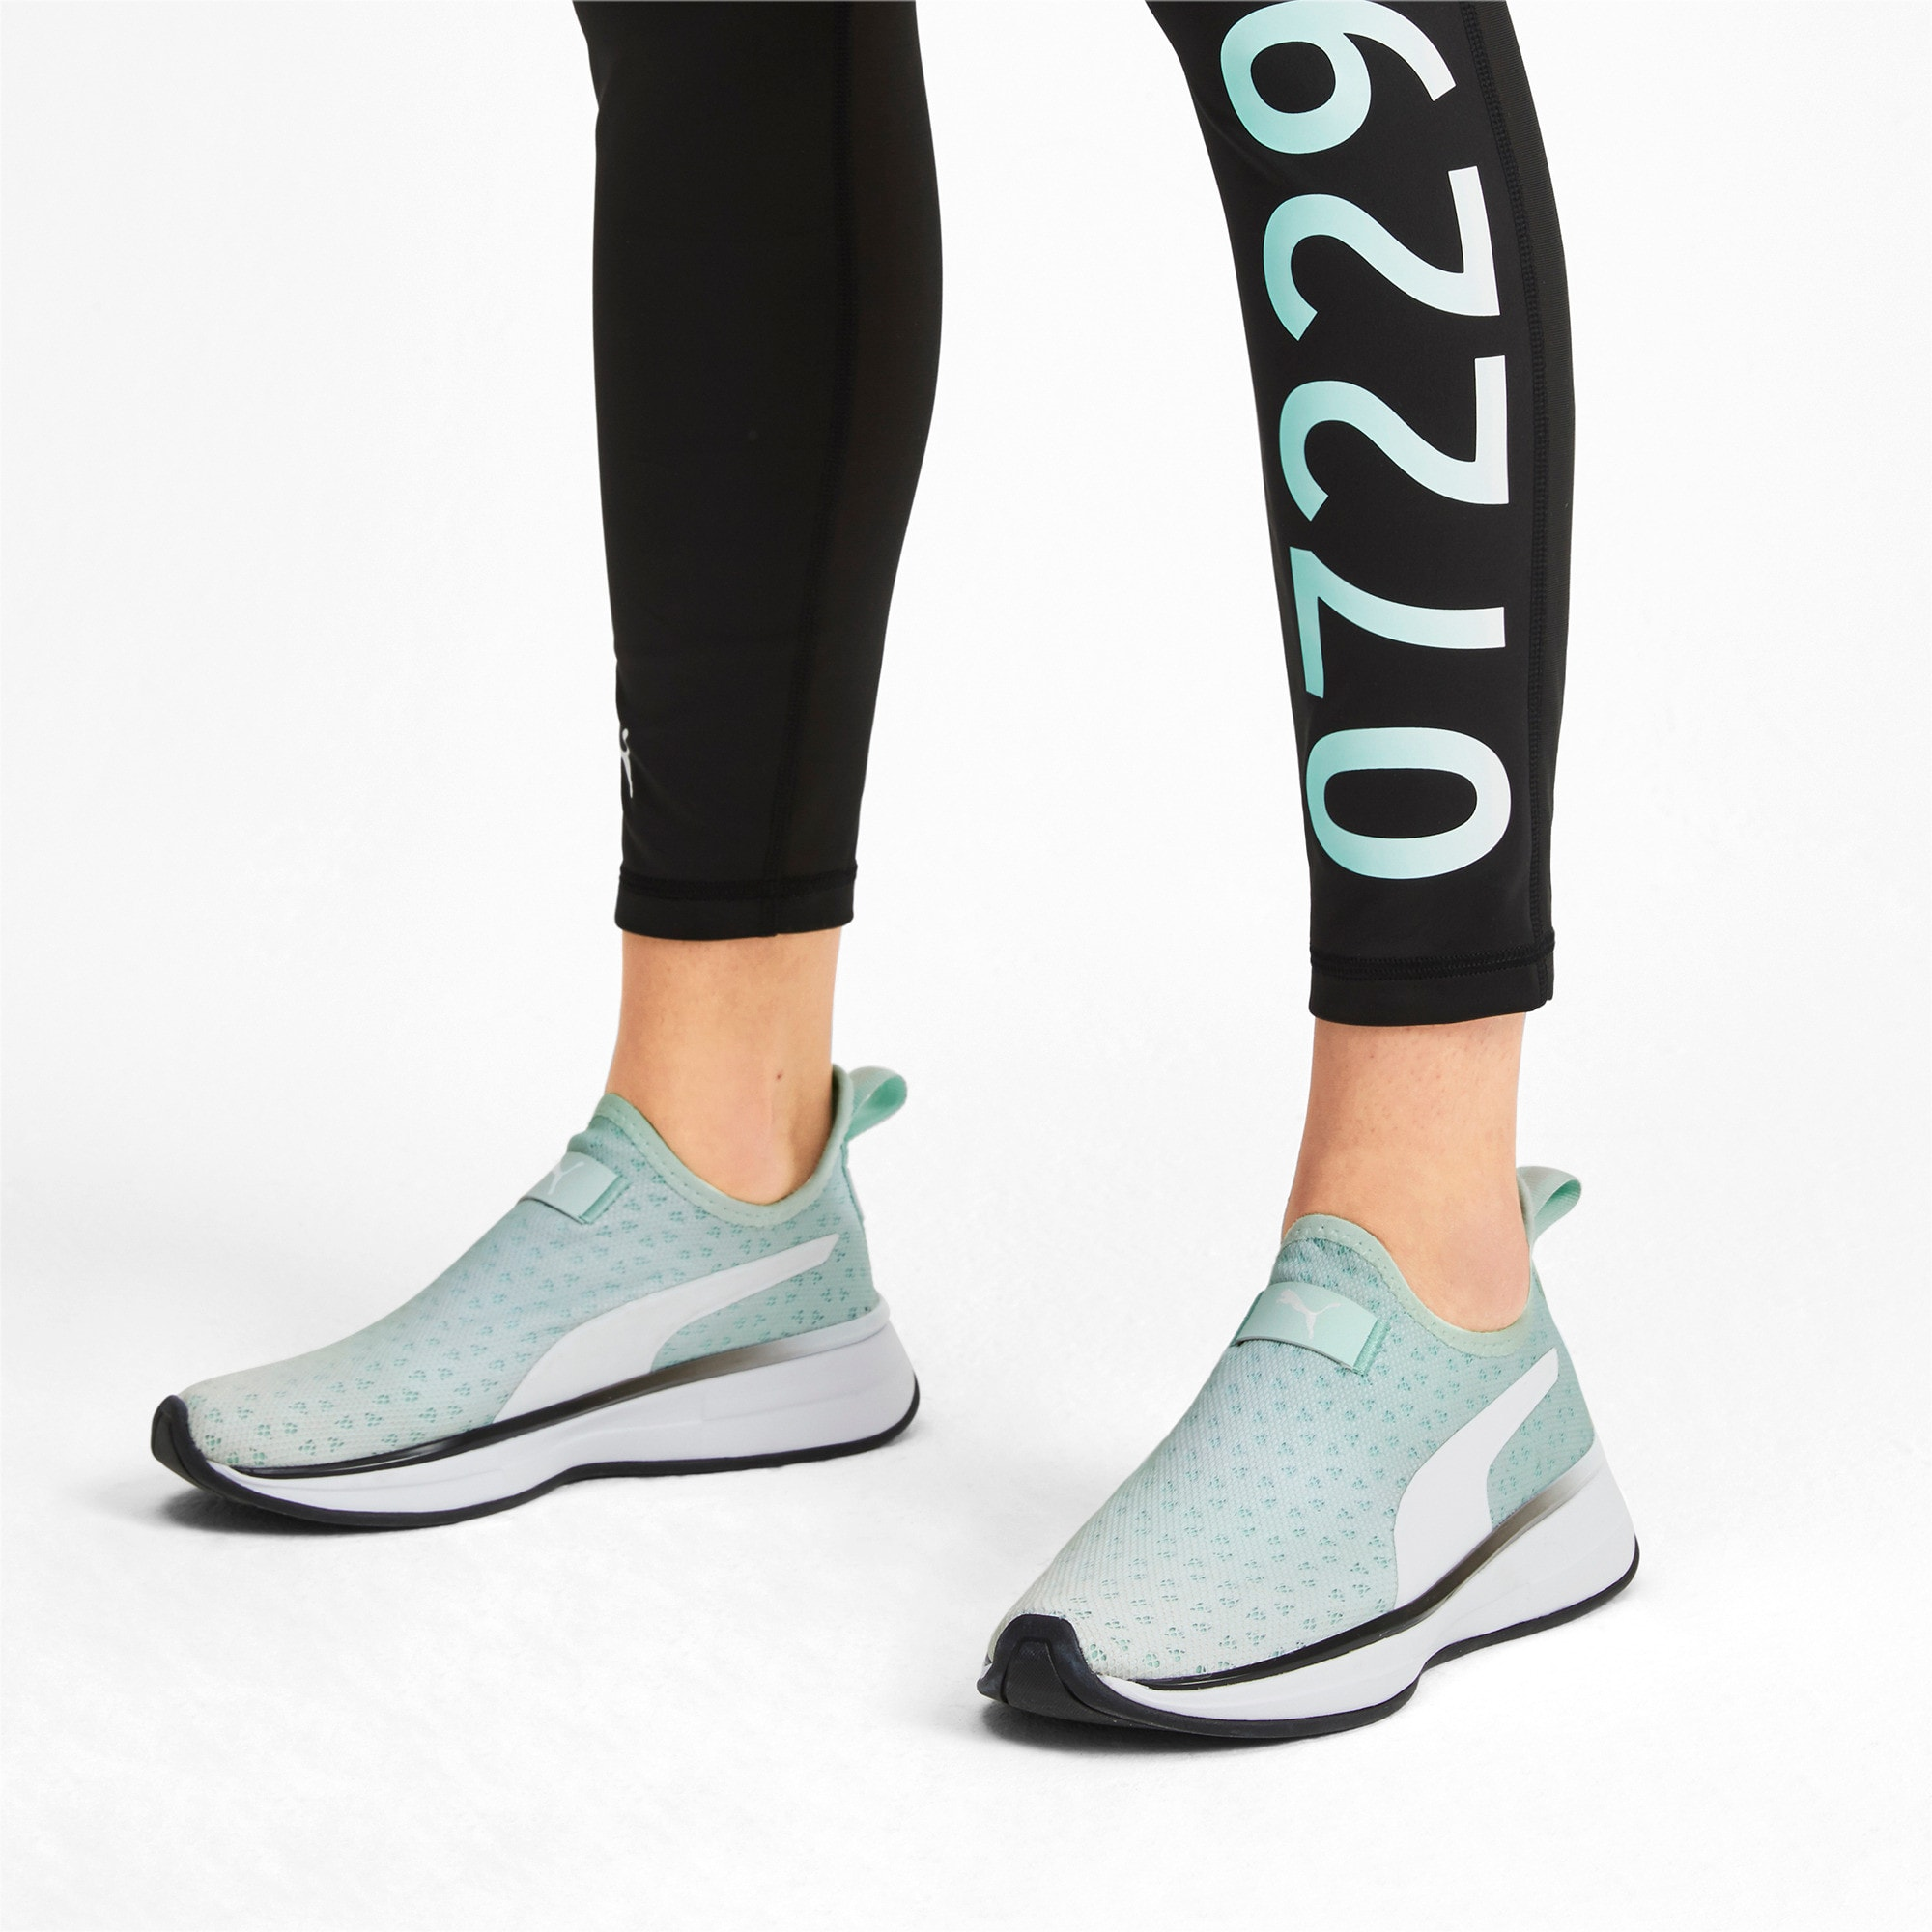 Details about Puma SG Slip On Bright Fade Selena Gomez Fair Aqua Women Running Shoes 192923 01